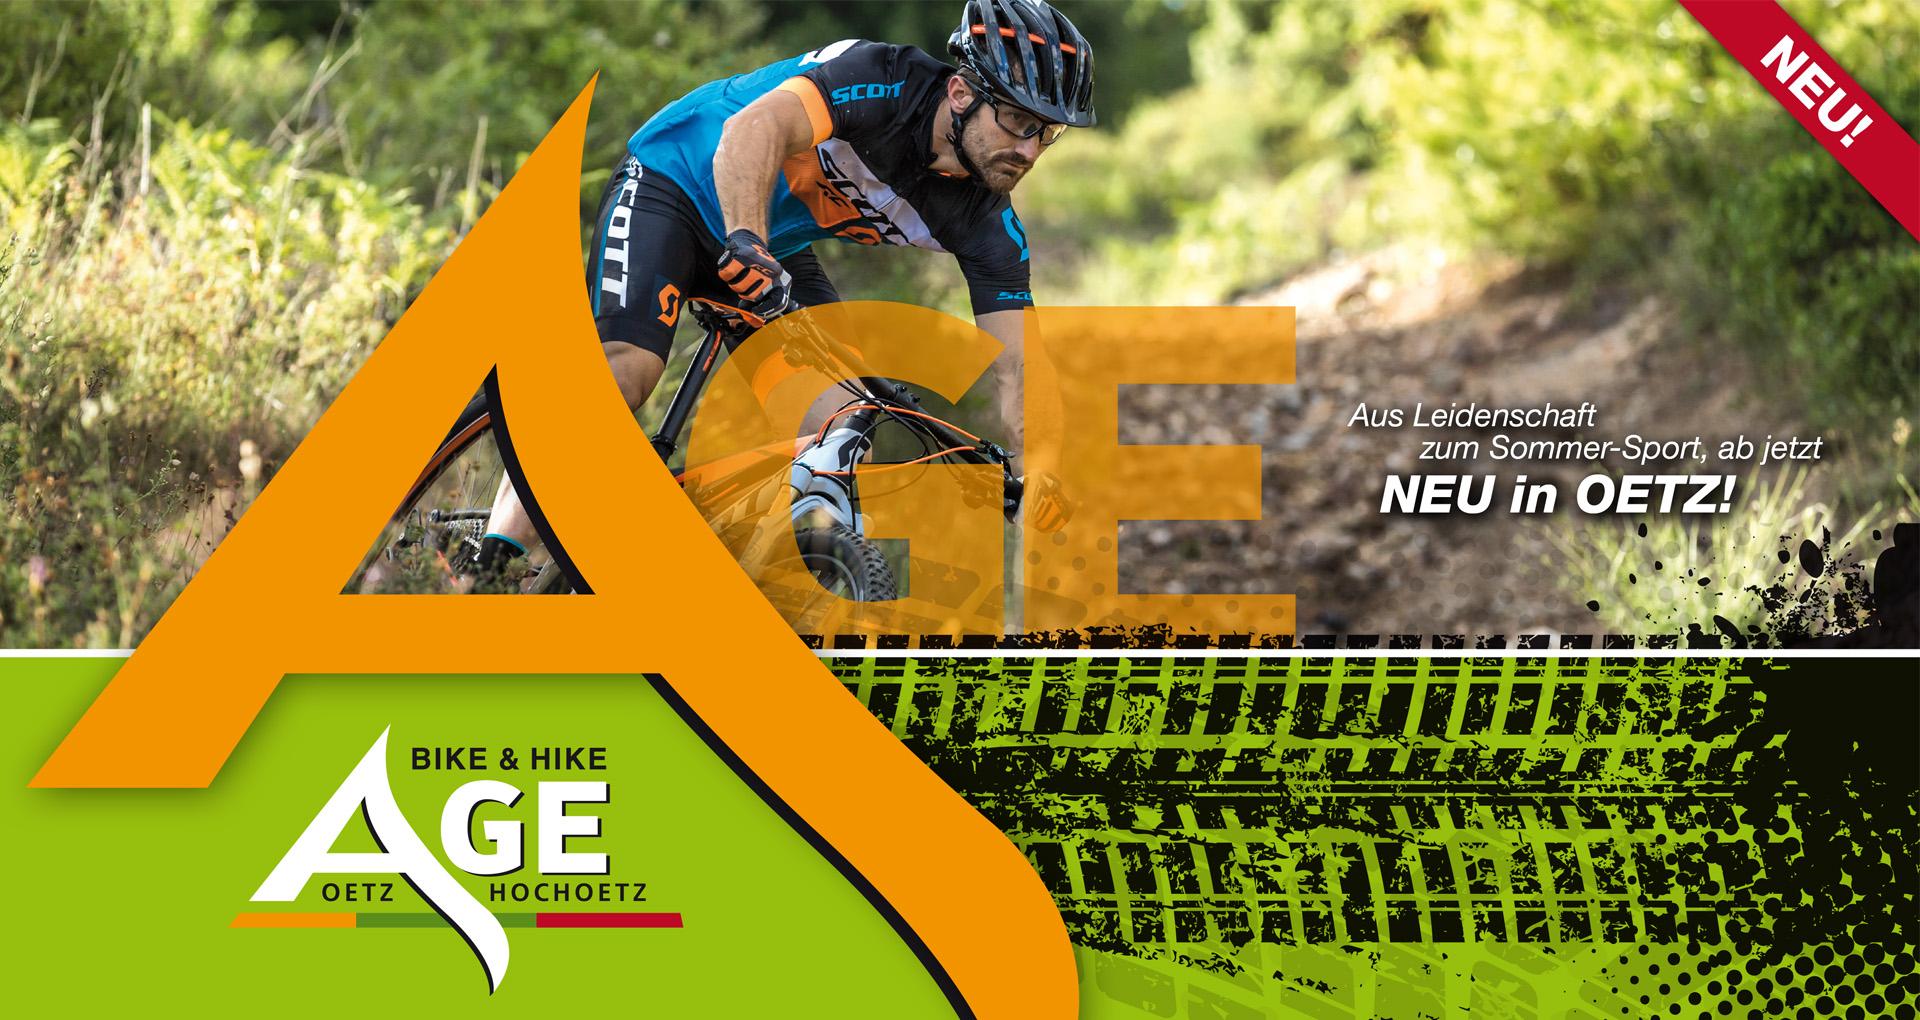 header_age_bikehike_1920x1020pixel